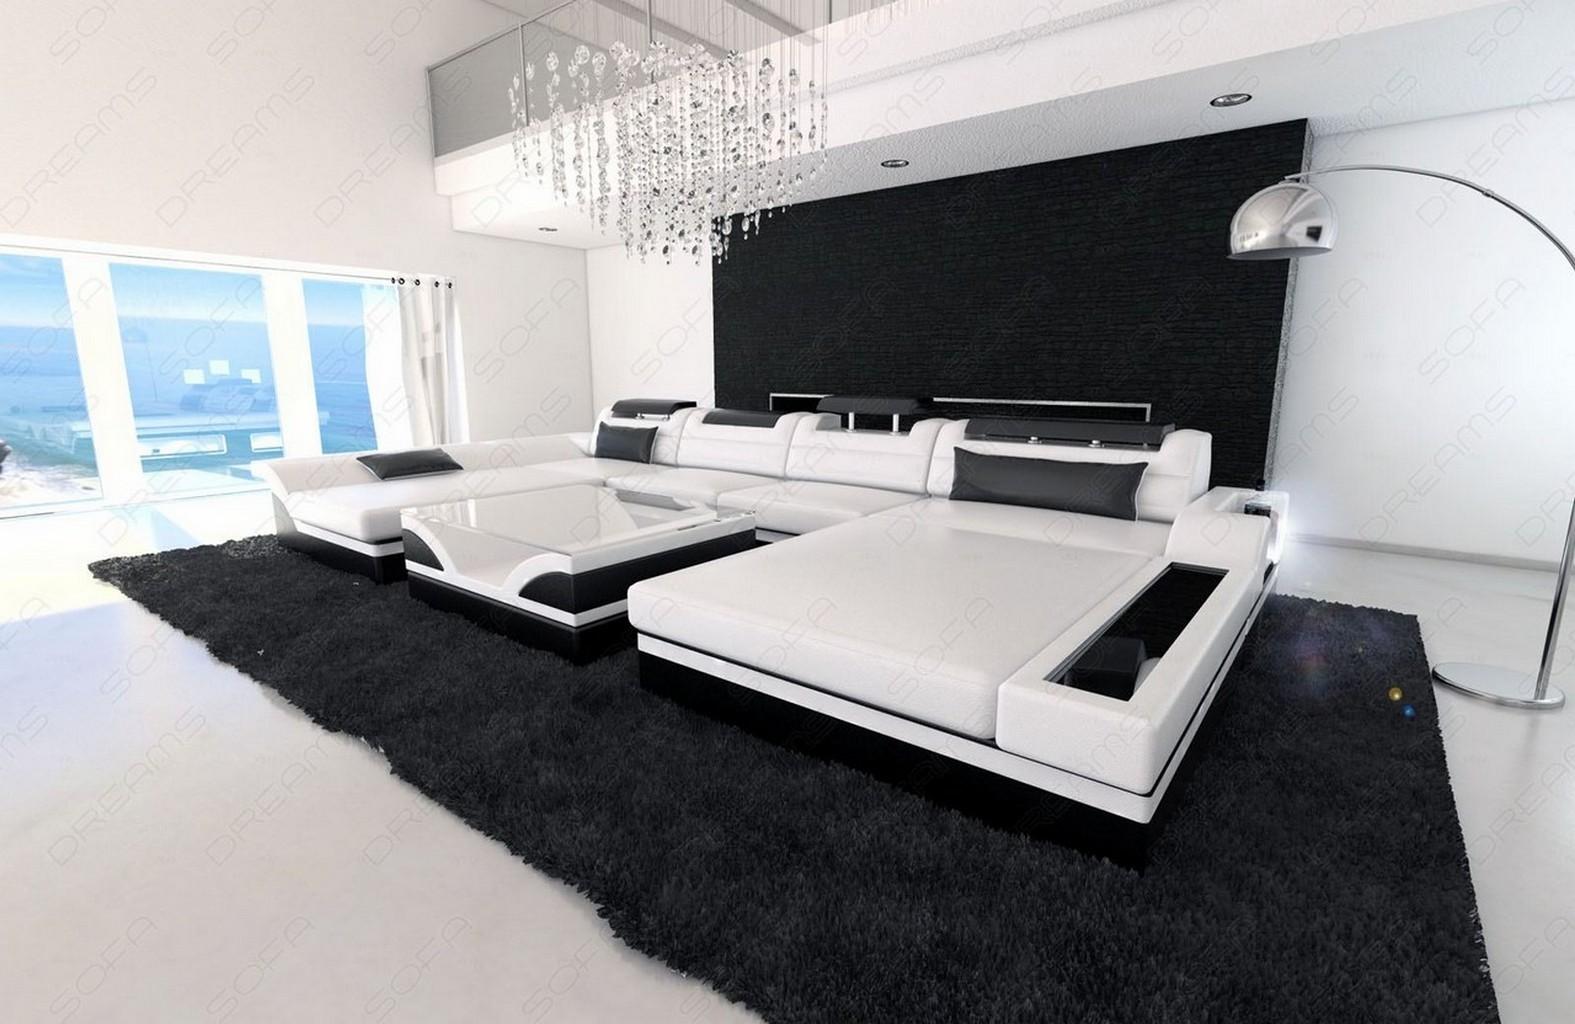 sofa u form xxl latest corner sofa xxl interior design. Black Bedroom Furniture Sets. Home Design Ideas